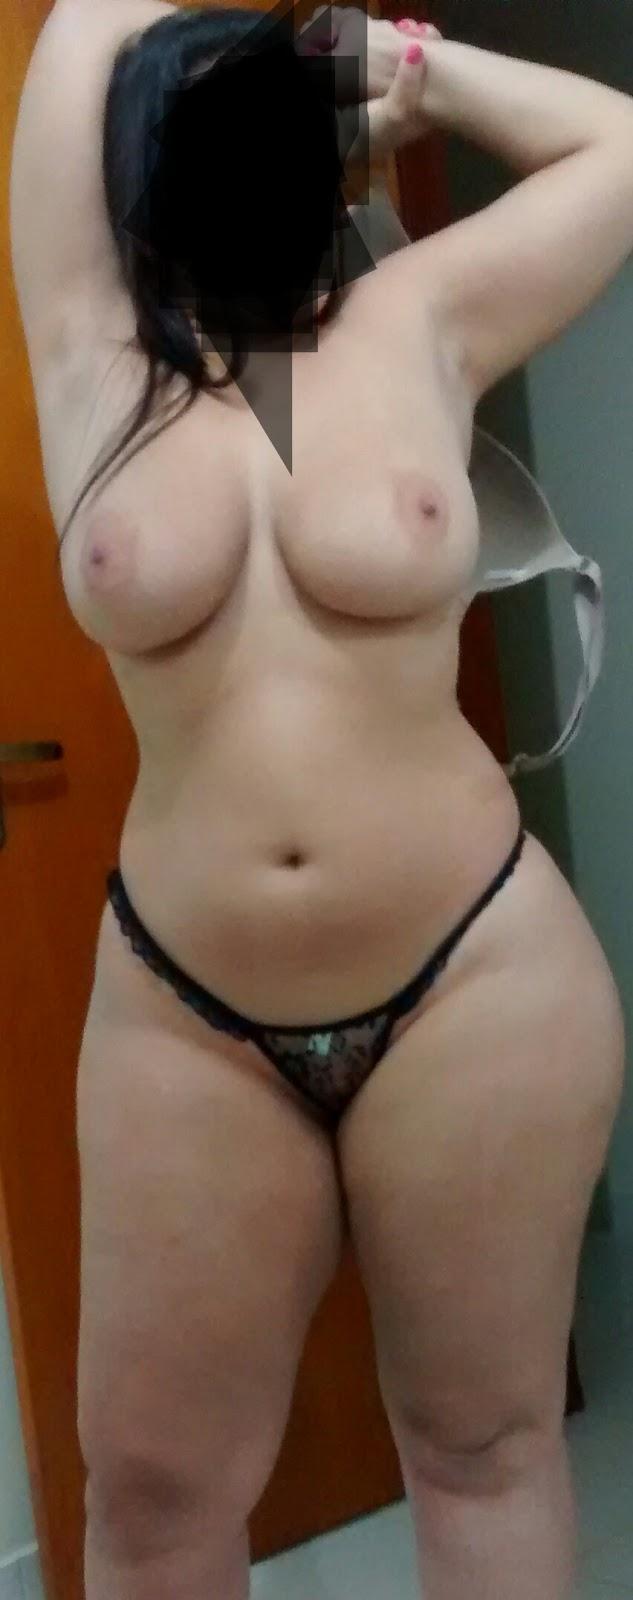 Anal com esposa gordinha hot anal bbw wife chubby 4